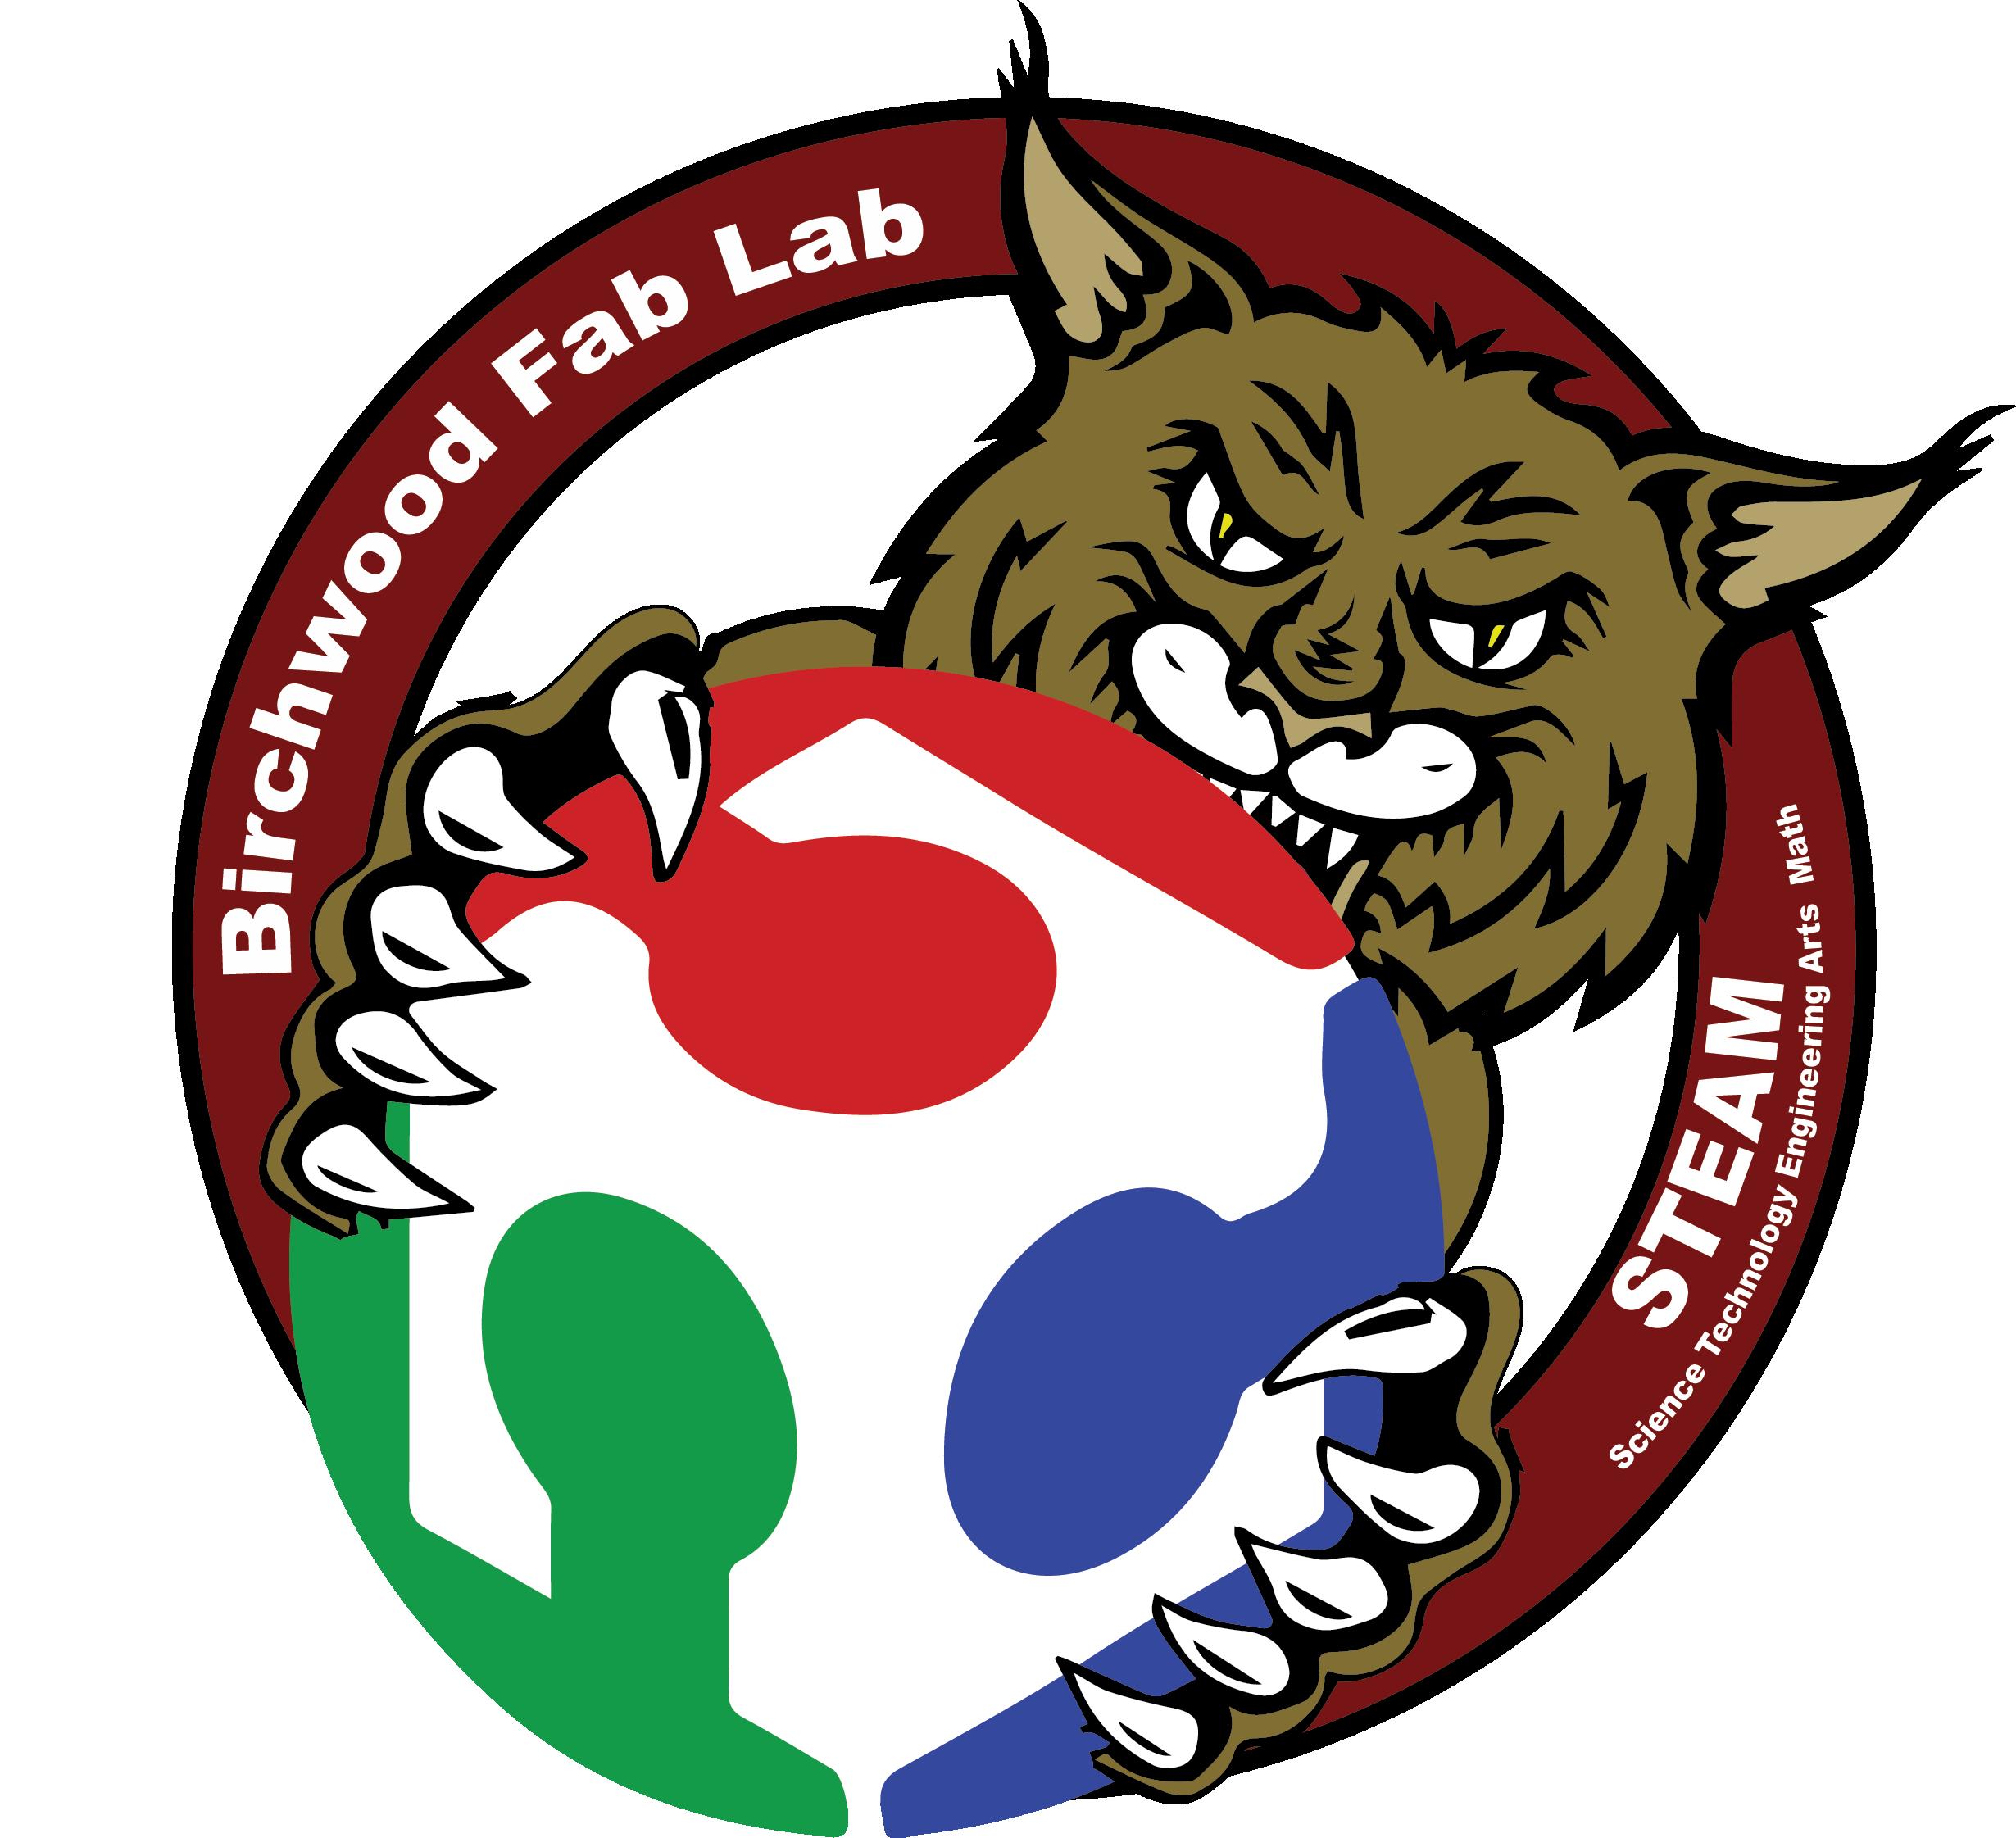 Lab clipart lab tech. Fab birchwood school district